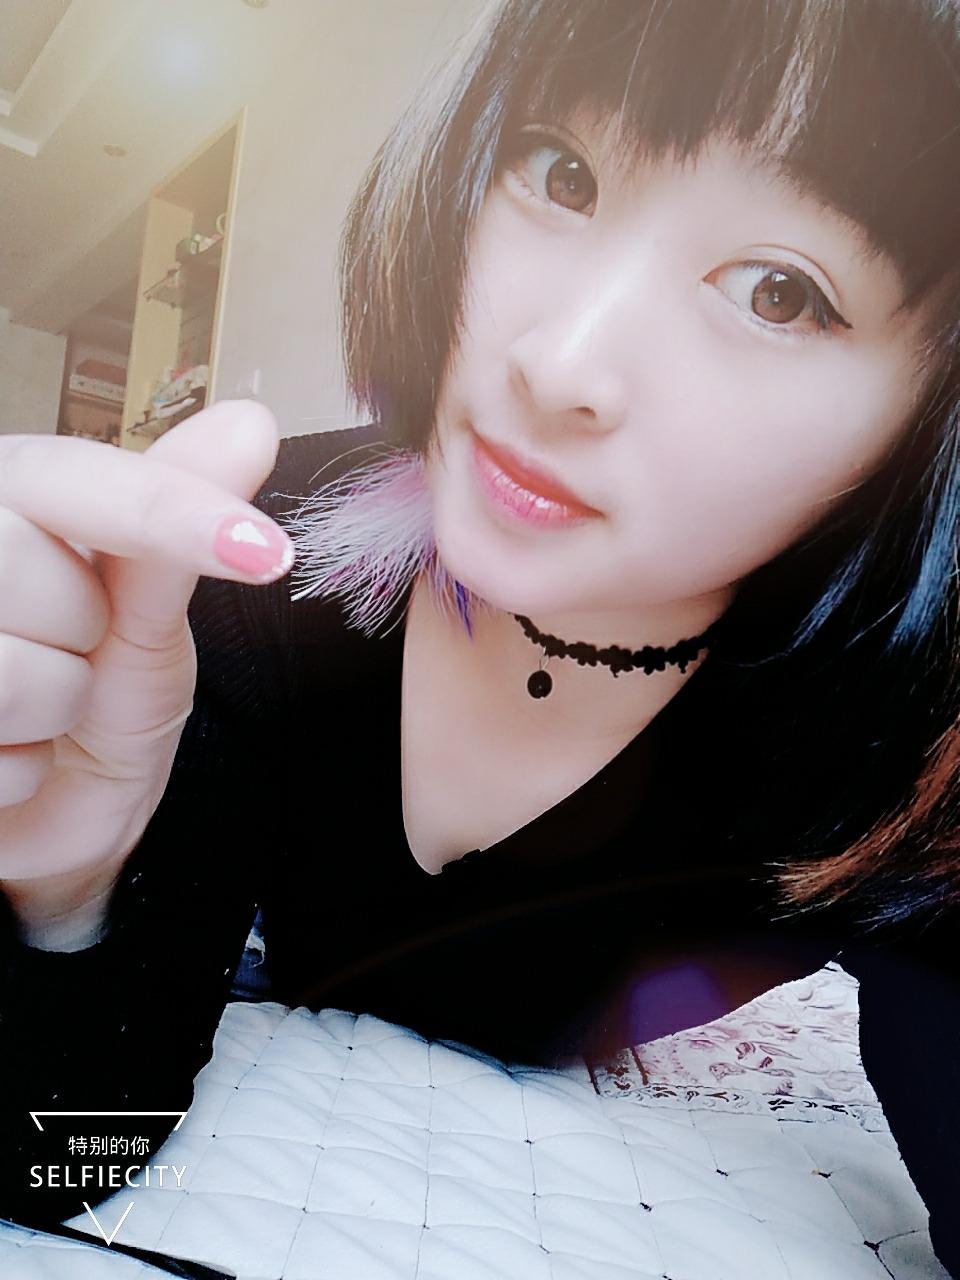 SelfieCity_20180323170618_save_mr1521796498944.jpg